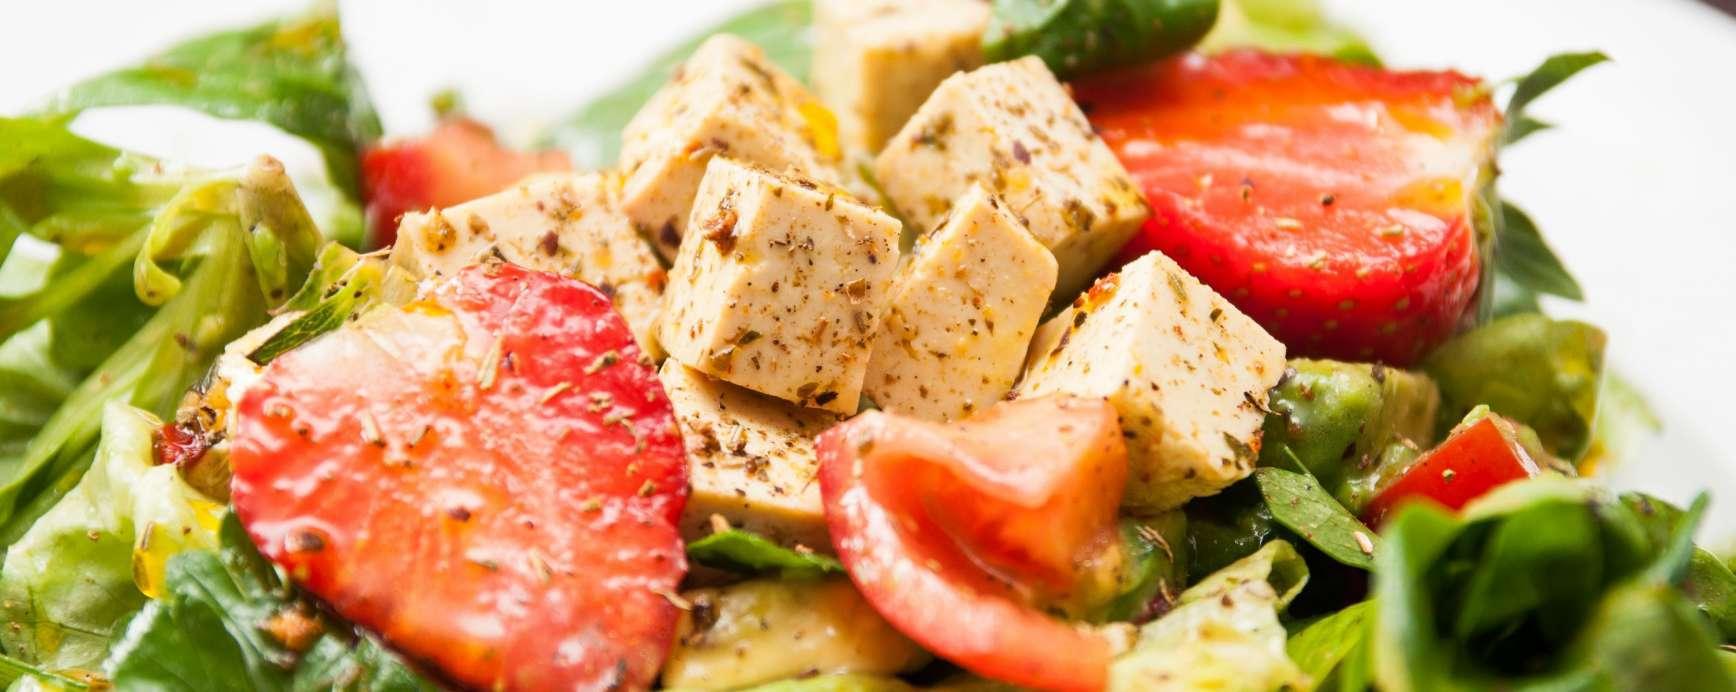 Veganistischer Käse aus Tofu Rezept